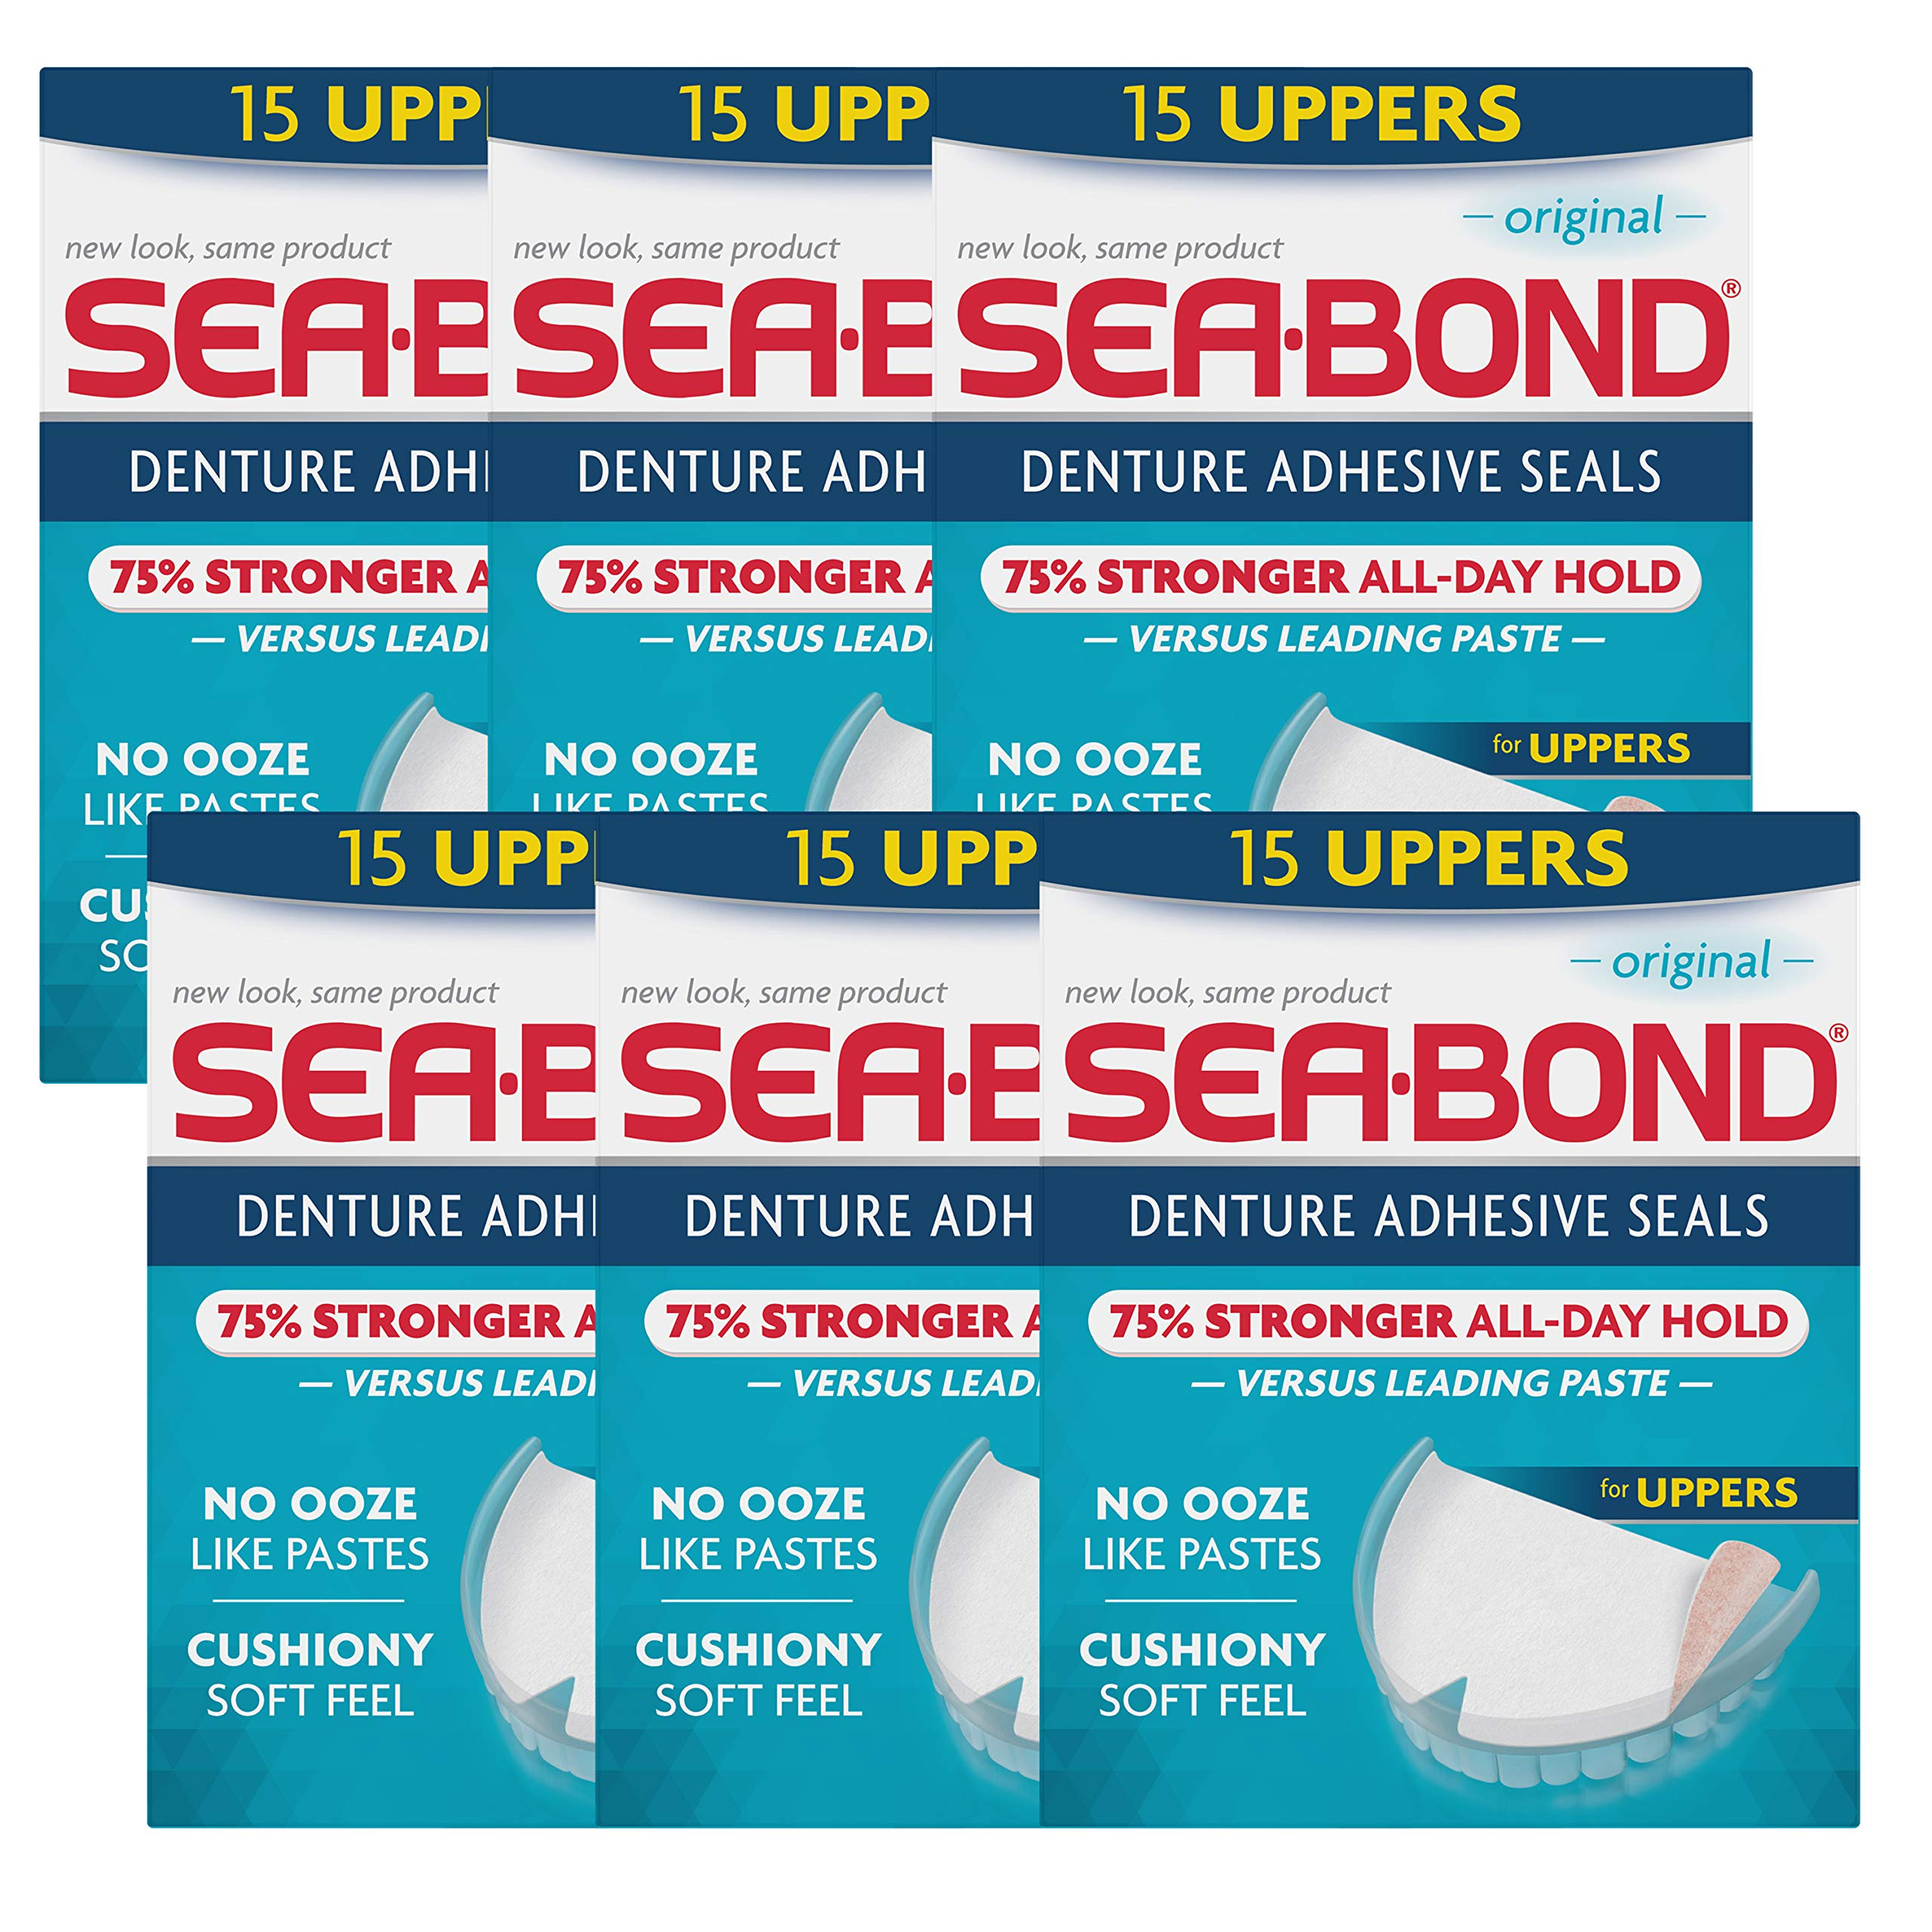 SEA-BOND Denture Adhesive Seals Uppers Original 15 ea (Pack of 6)